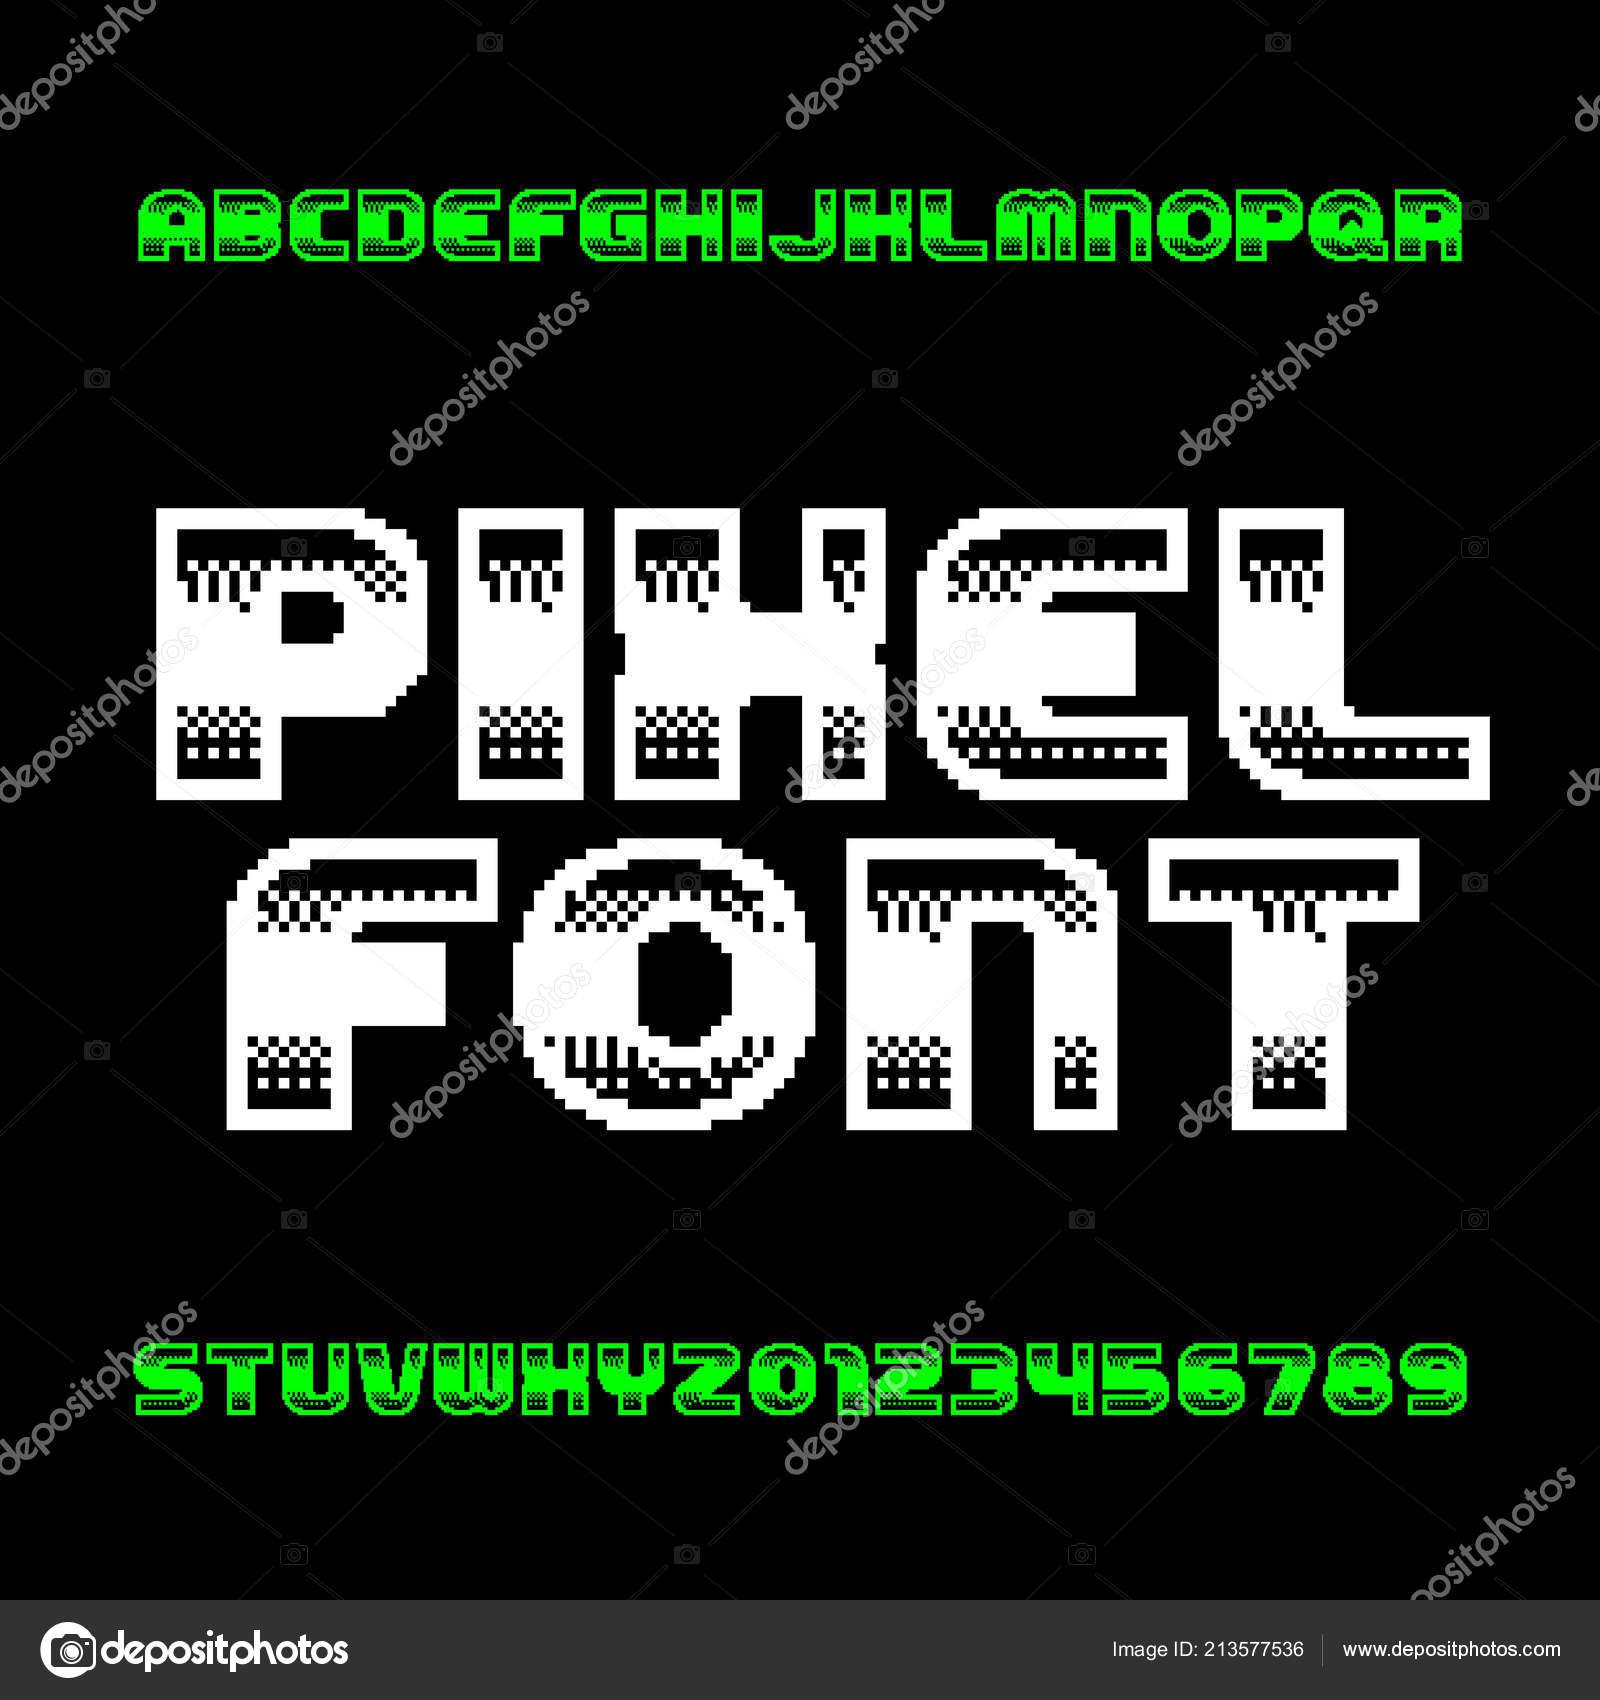 80s Arcade Sign Retro Computer Game Alphabet Font Monochrome Pixel Letters Numbers 80s Stock Vector C Epifantsev 213577536